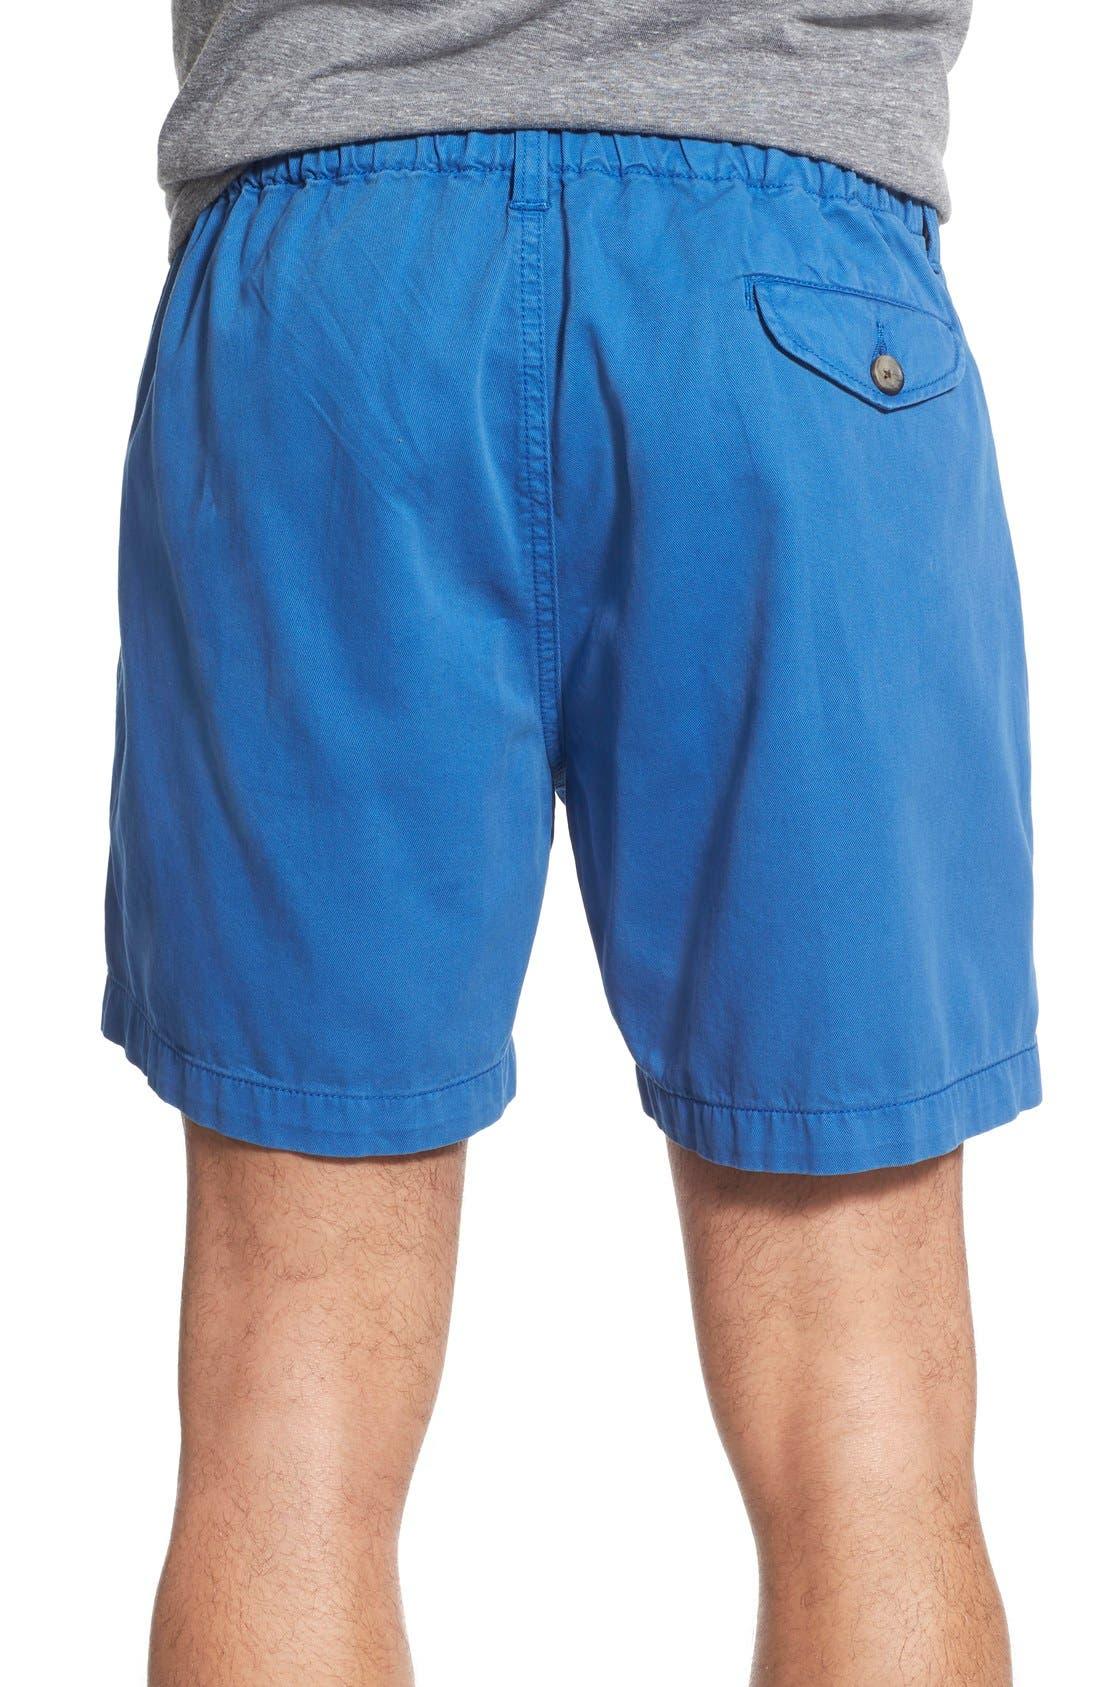 Alternate Image 2  - Vintage 1946 'Snappers' Vintage Washed Elastic Waistband Shorts